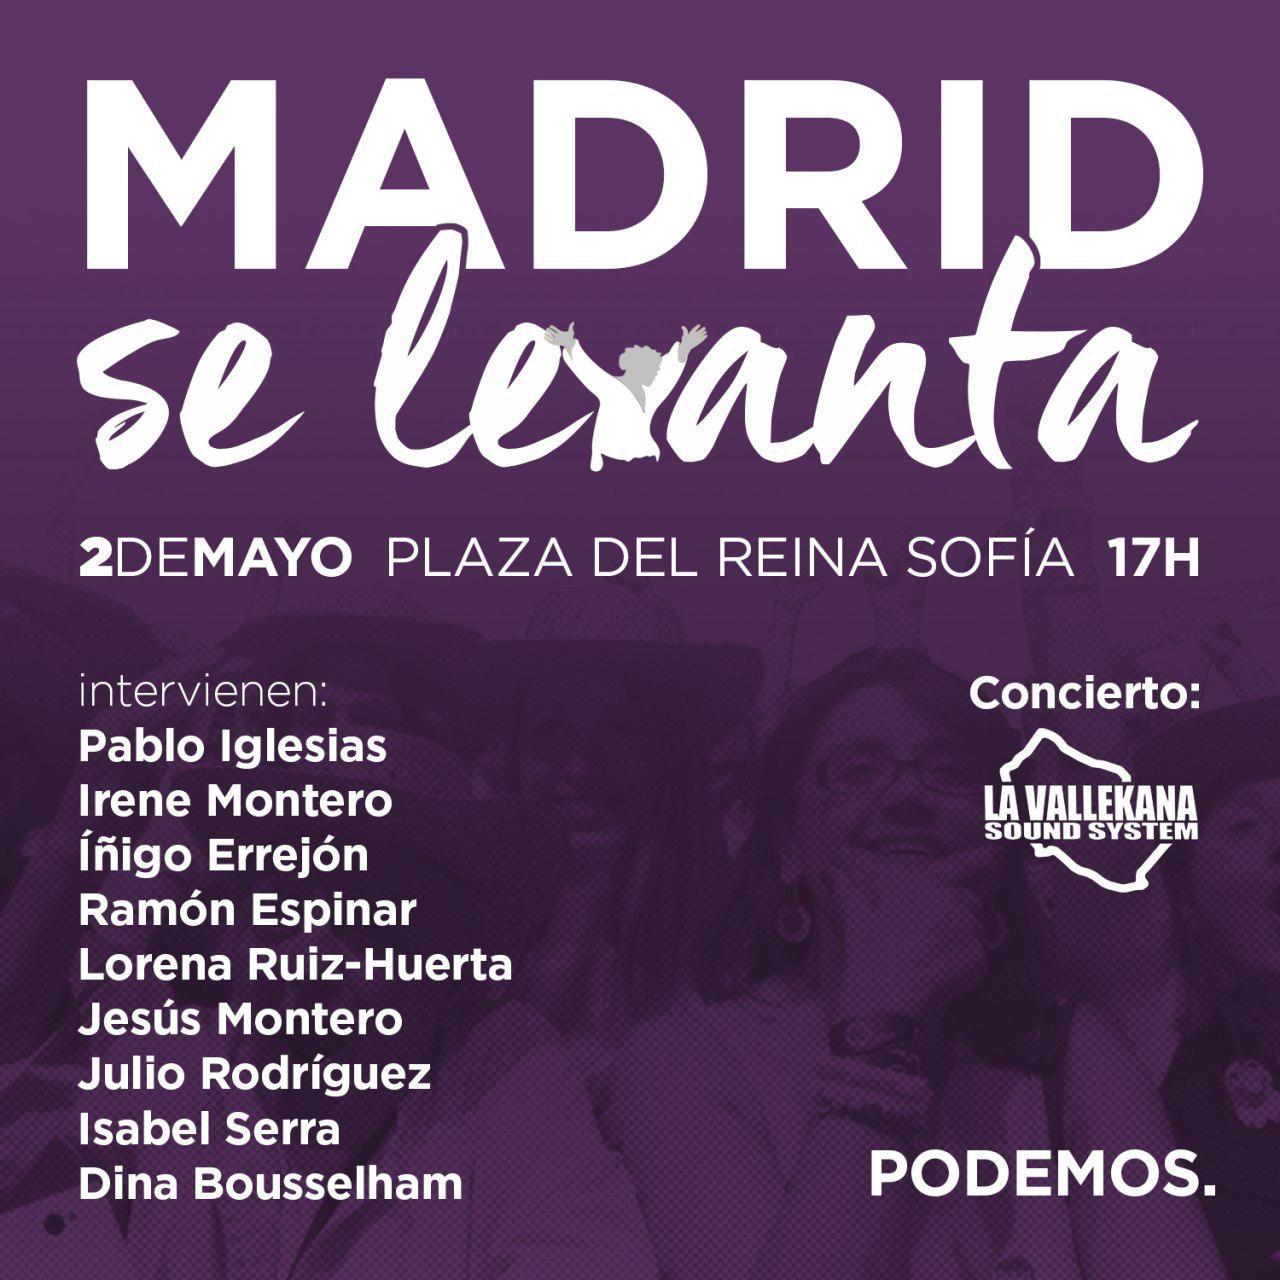 MADRID se levanta